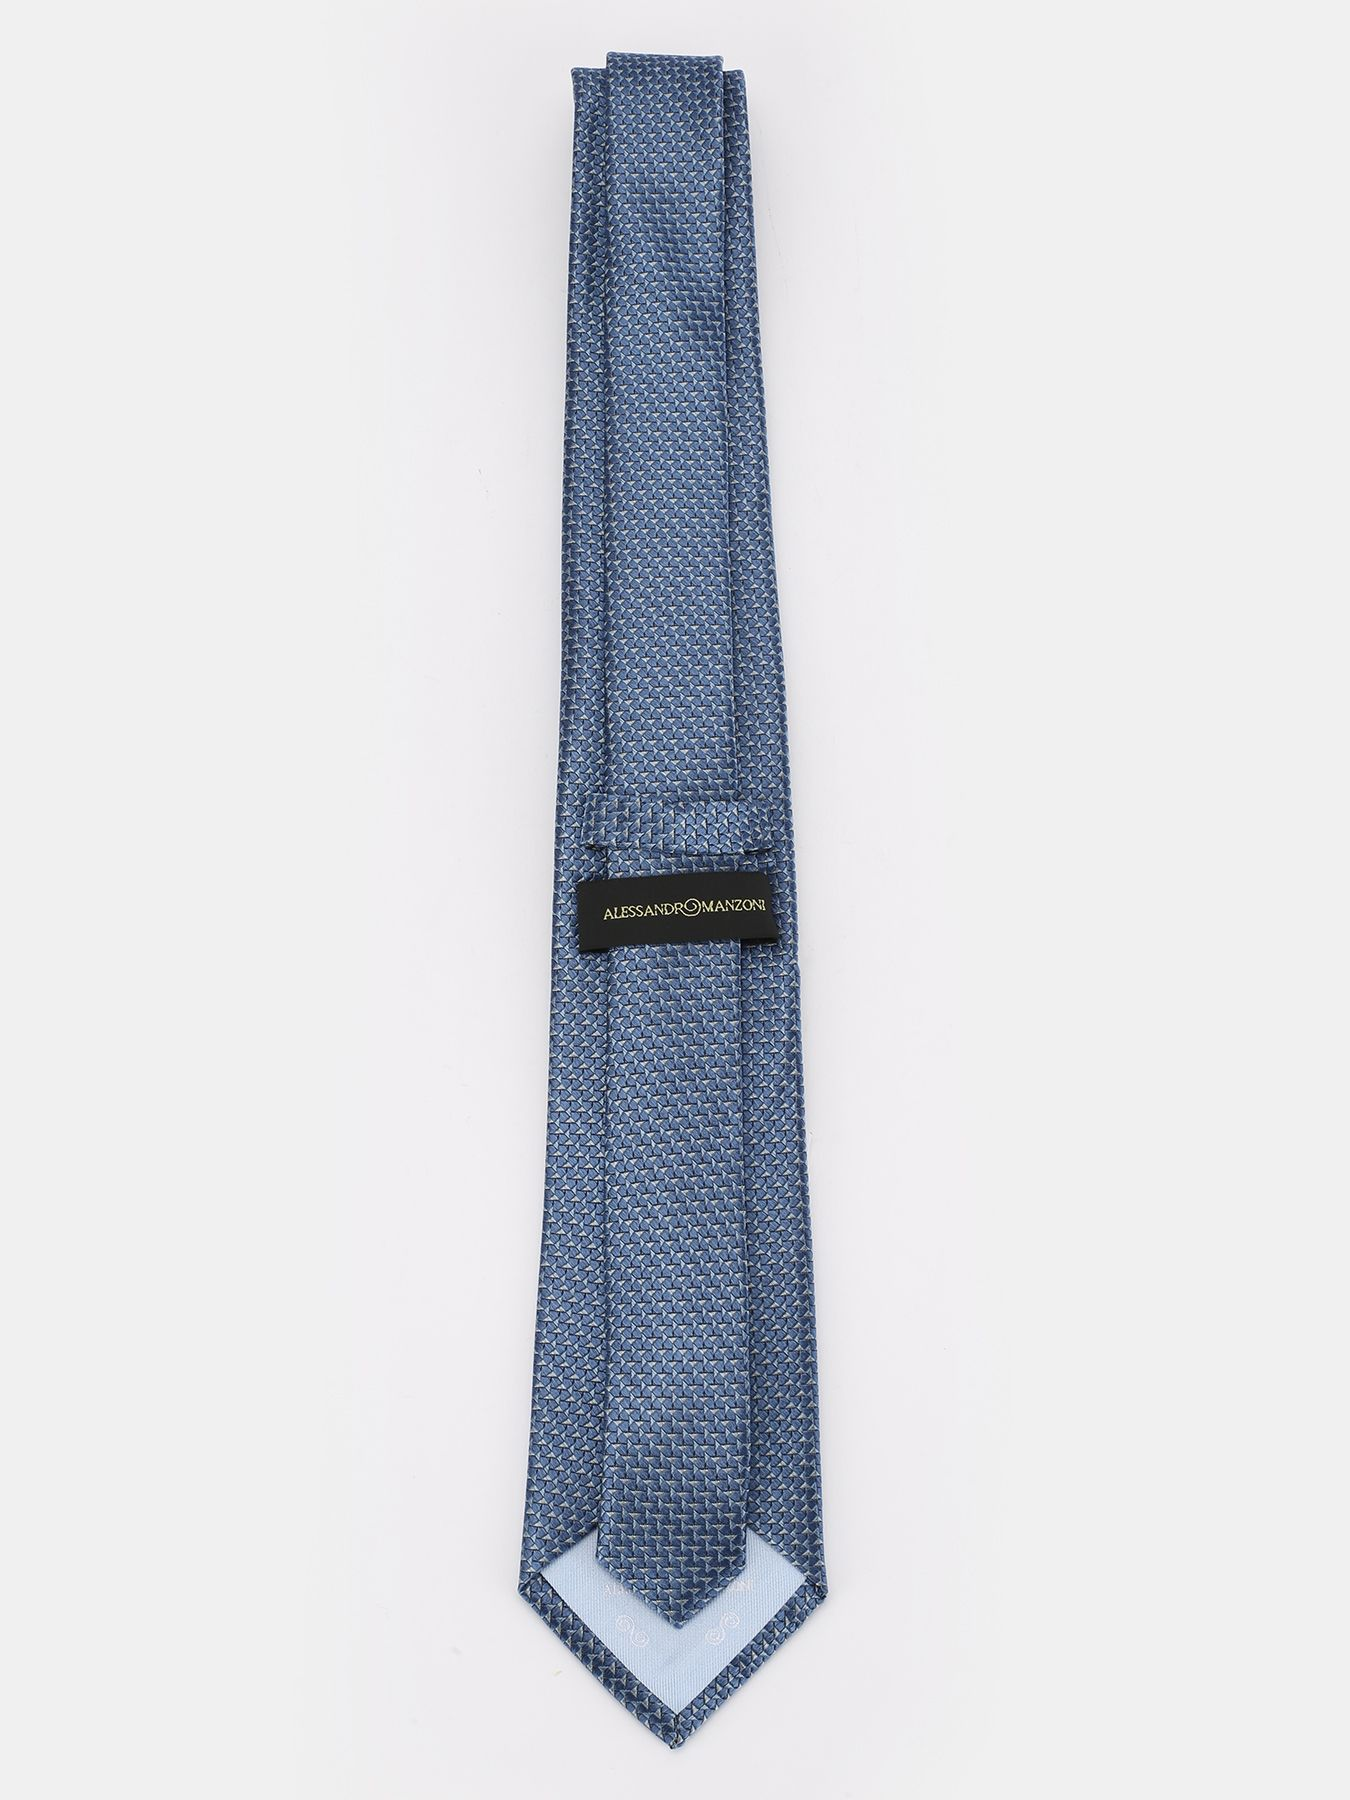 Alessandro Manzoni Шелковый галстук 312361-185 Фото 2